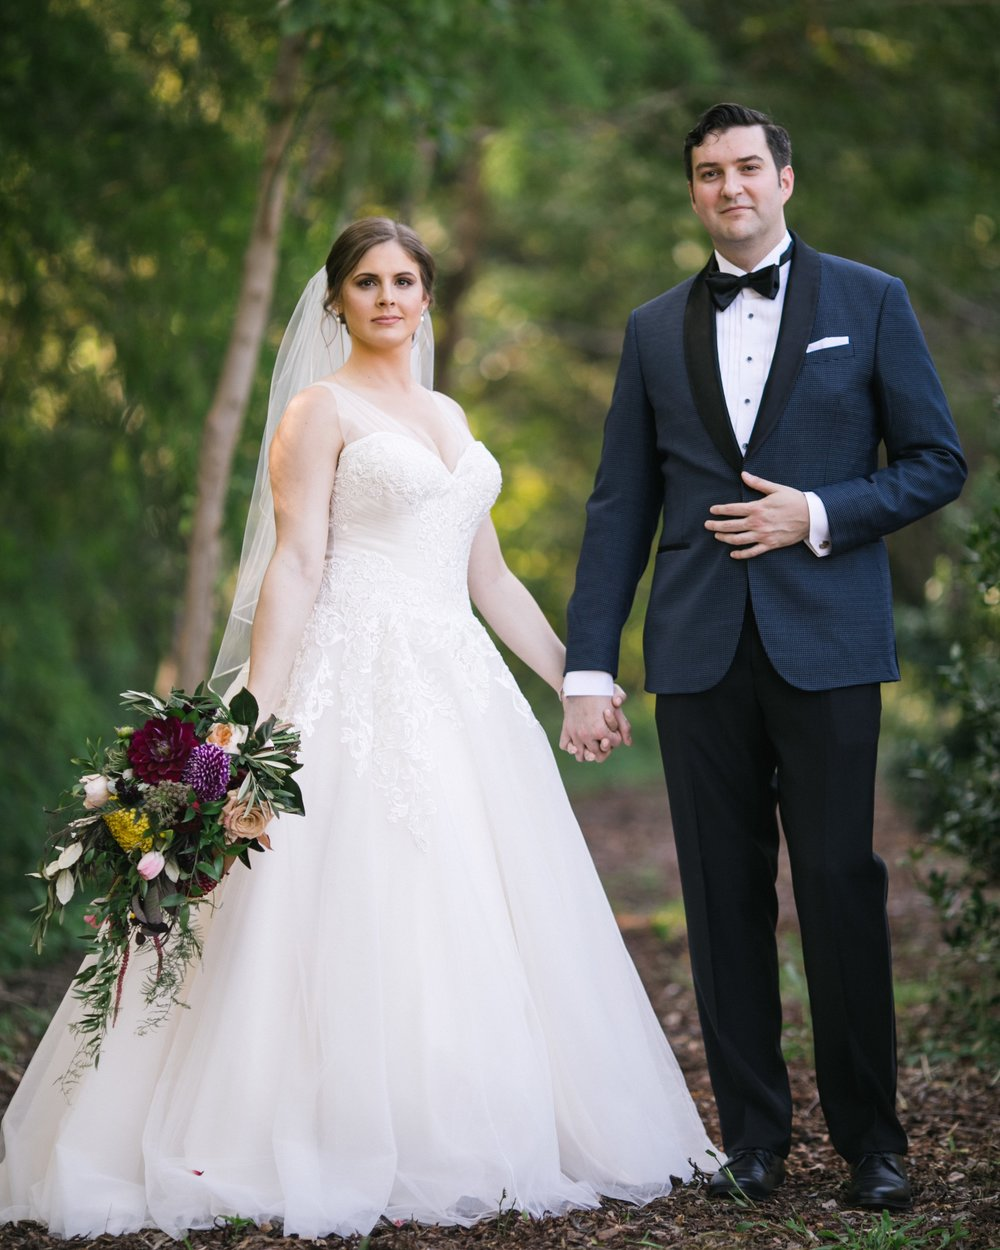 Bridal bouquet, cascading, jewel tones, organic